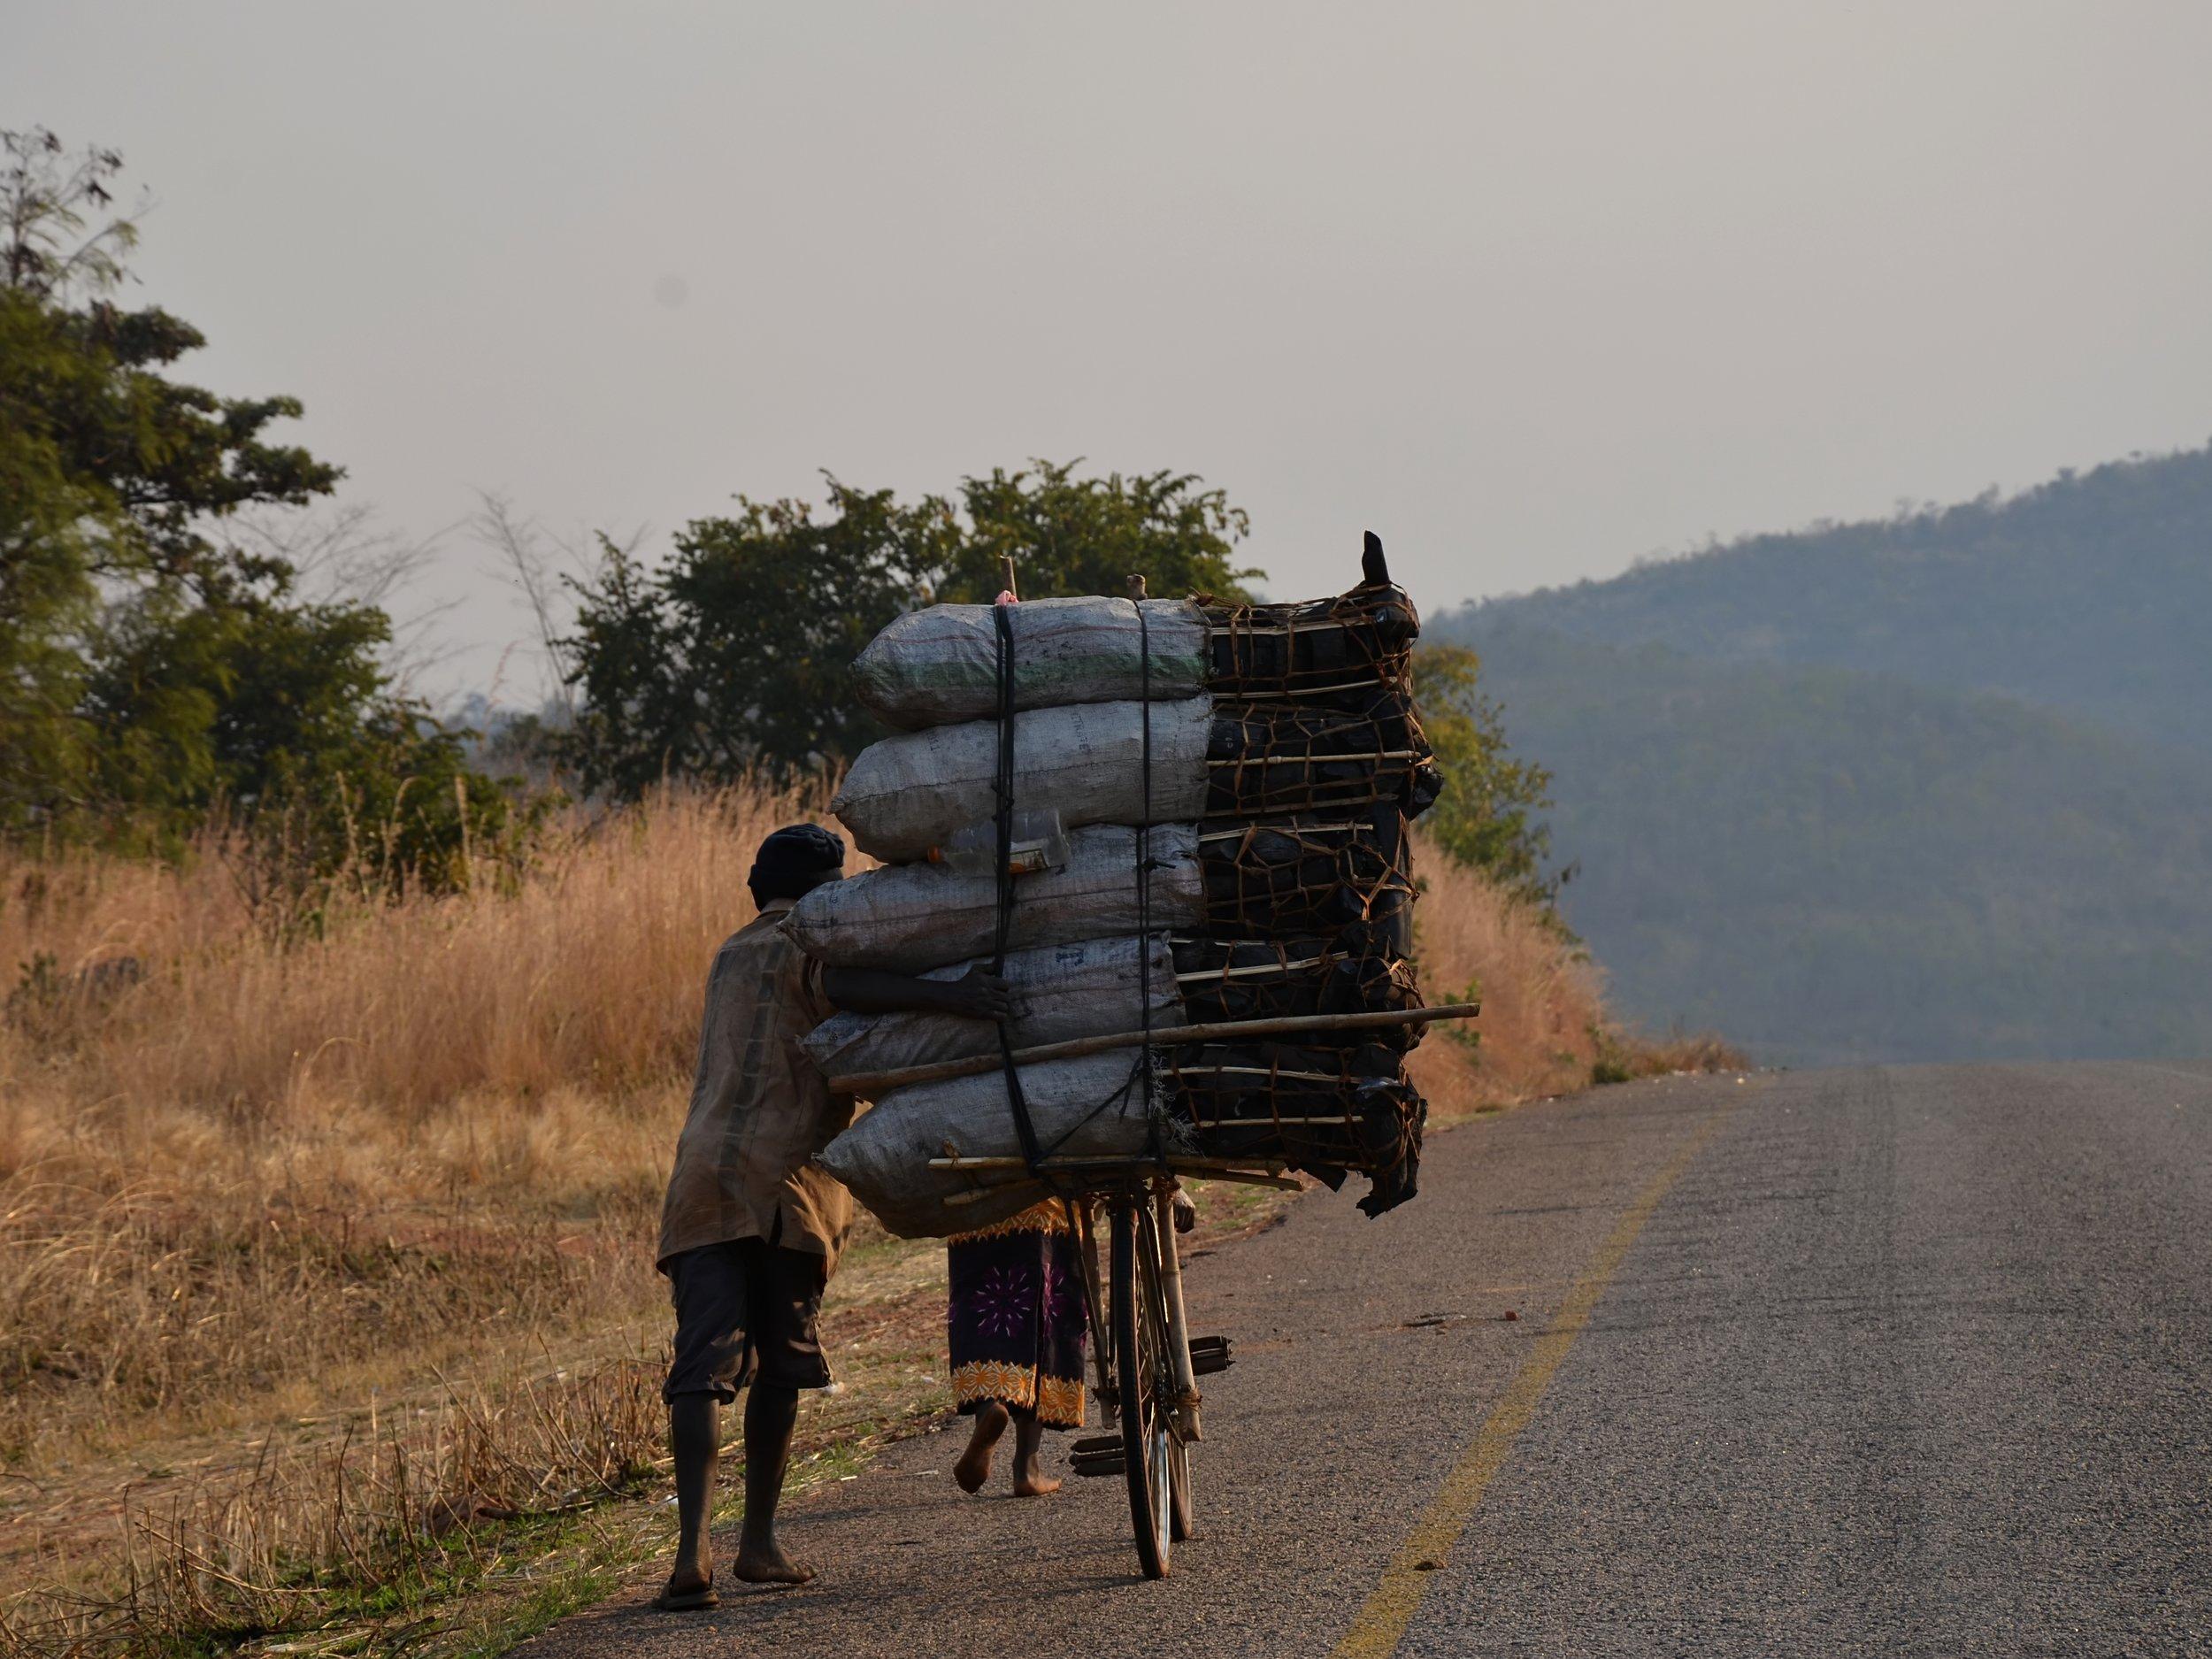 Charcoal on Lundazi Road, eastern Zambia Photo credit: Hans Hillewaert, Flickr.  Link .